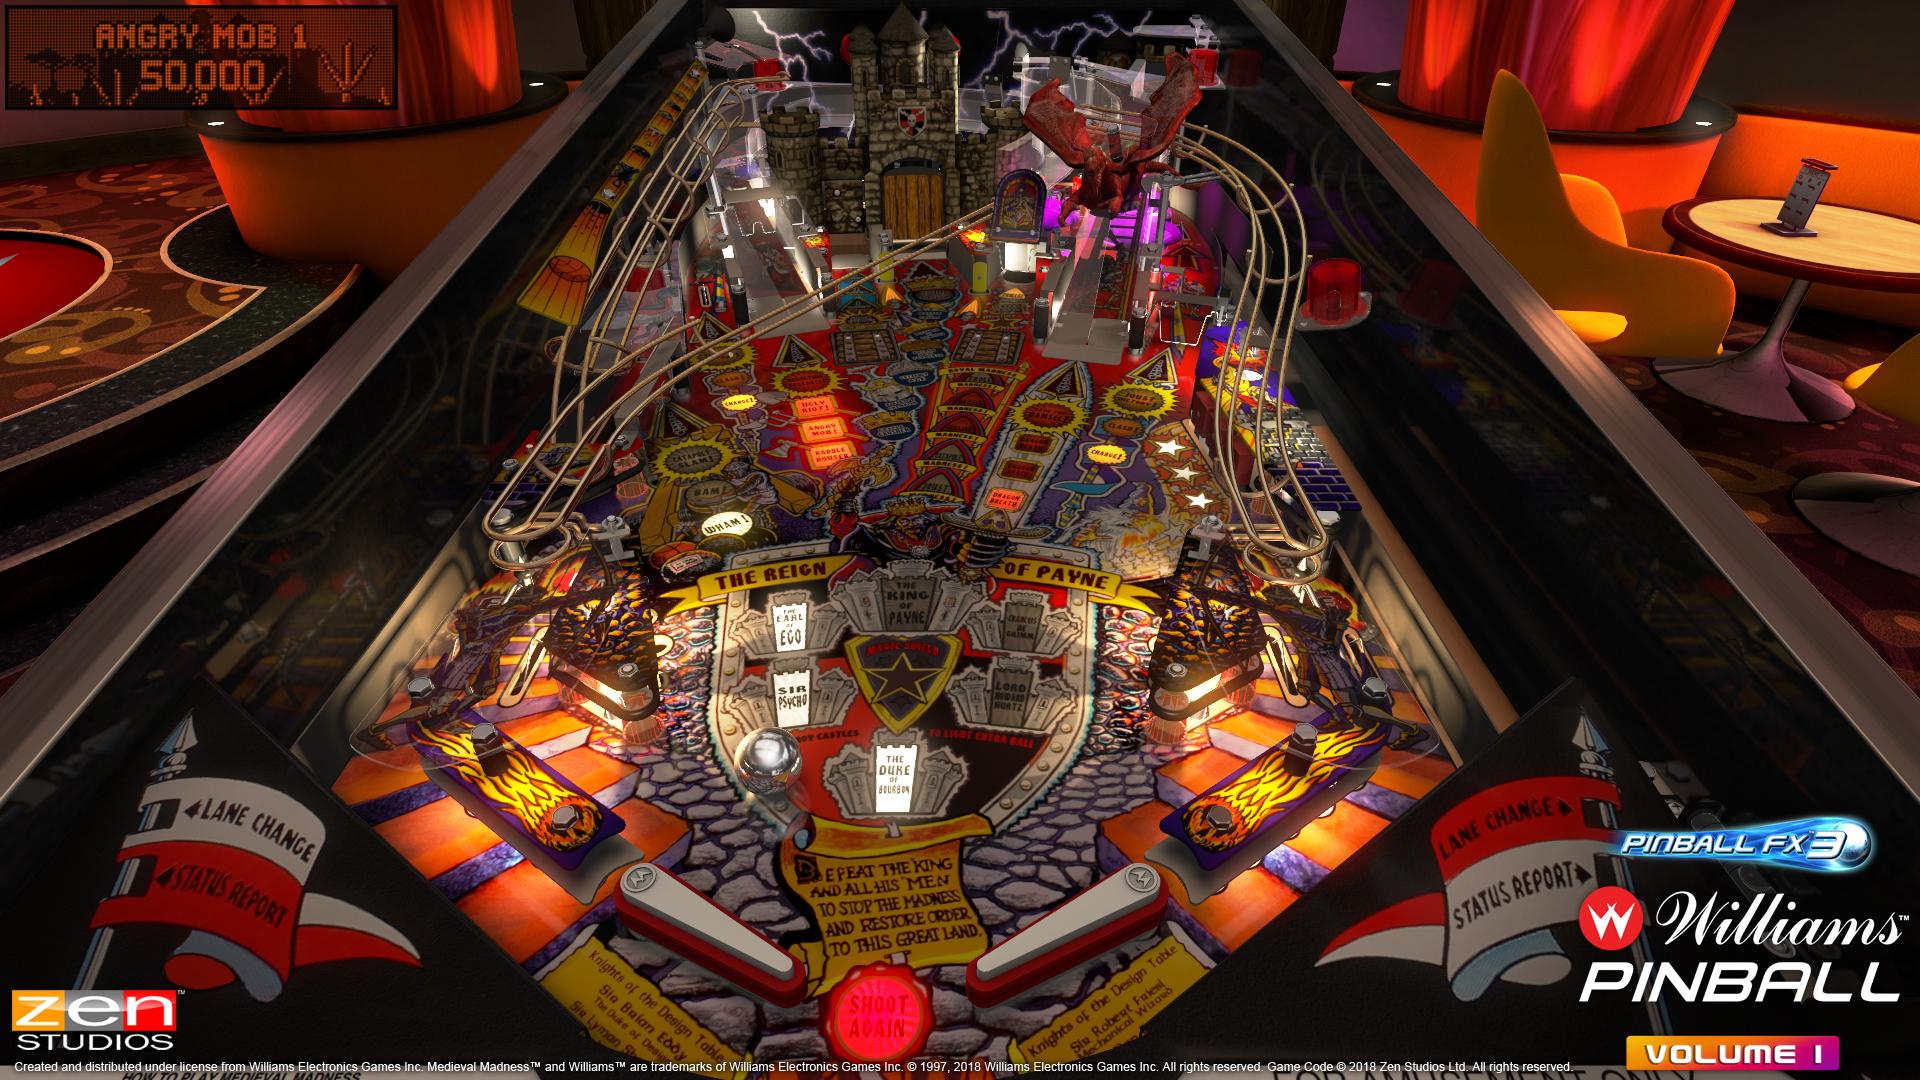 The Pinball (digital and physical) ERA |OT| Full Tilt | ResetEra